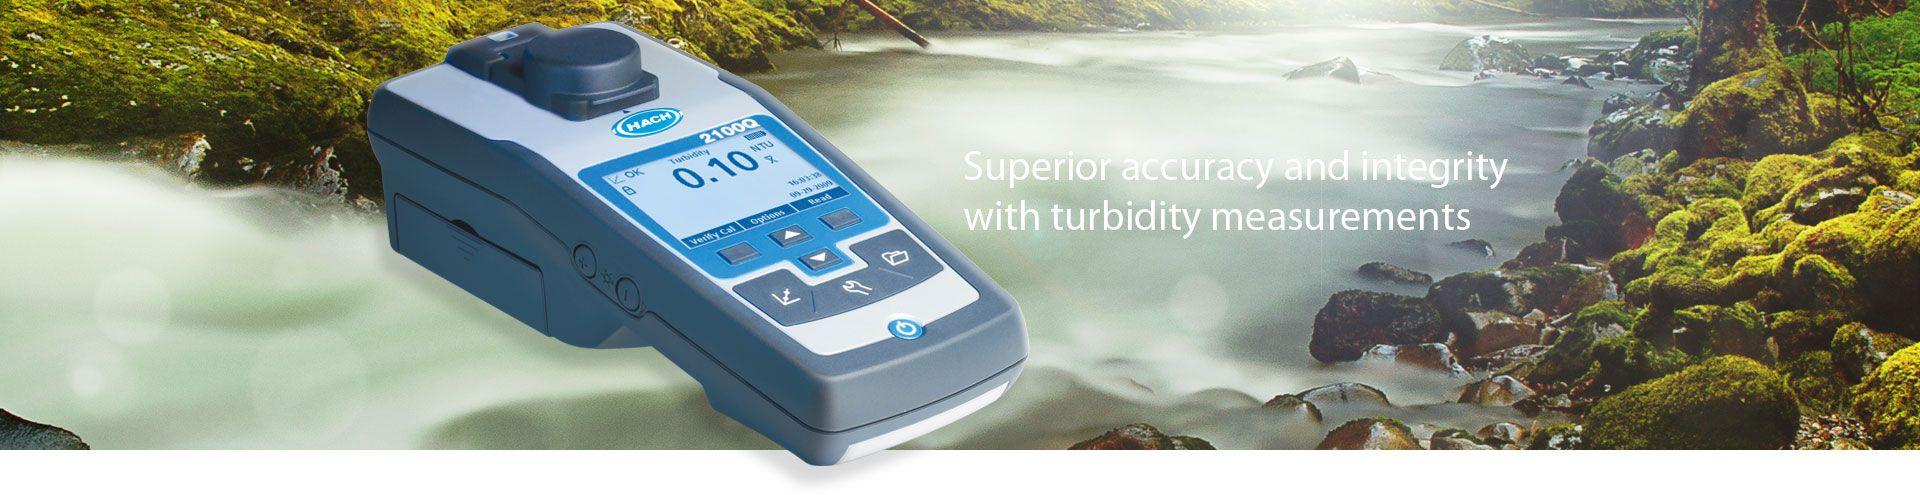 2100Q Portable Turbidity Meter Rental